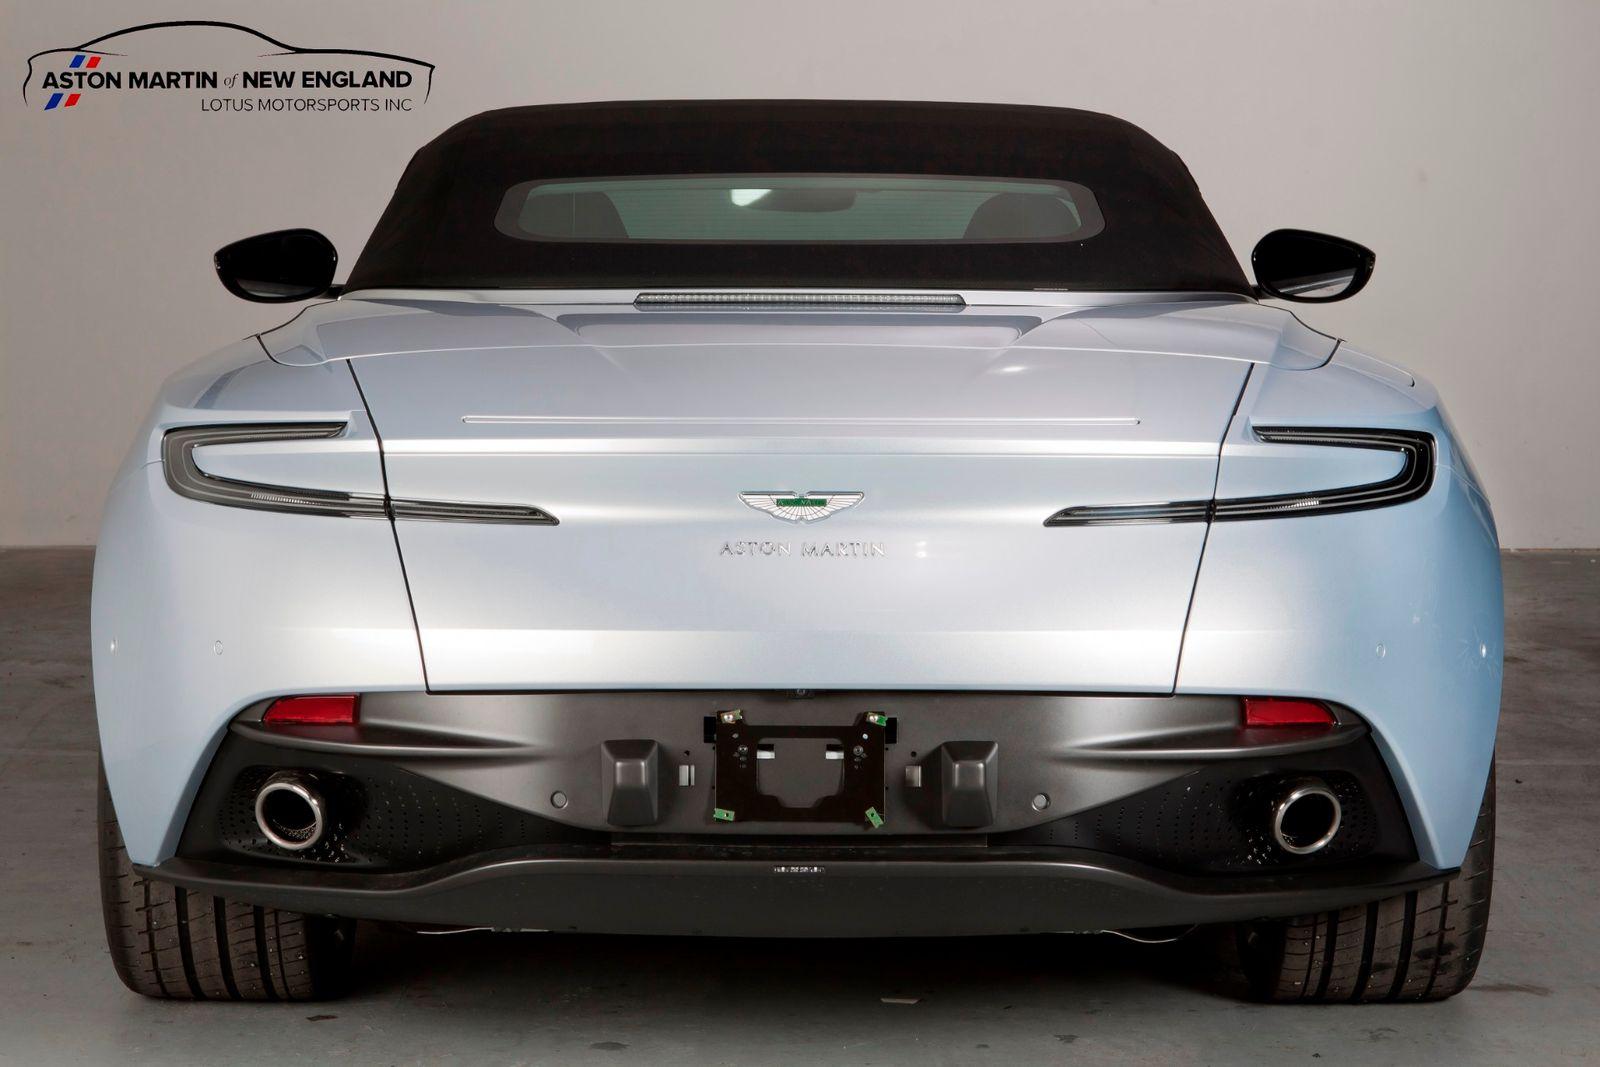 2019 Aston Martin Db11 Volante City Ma Aston Martin Of New England